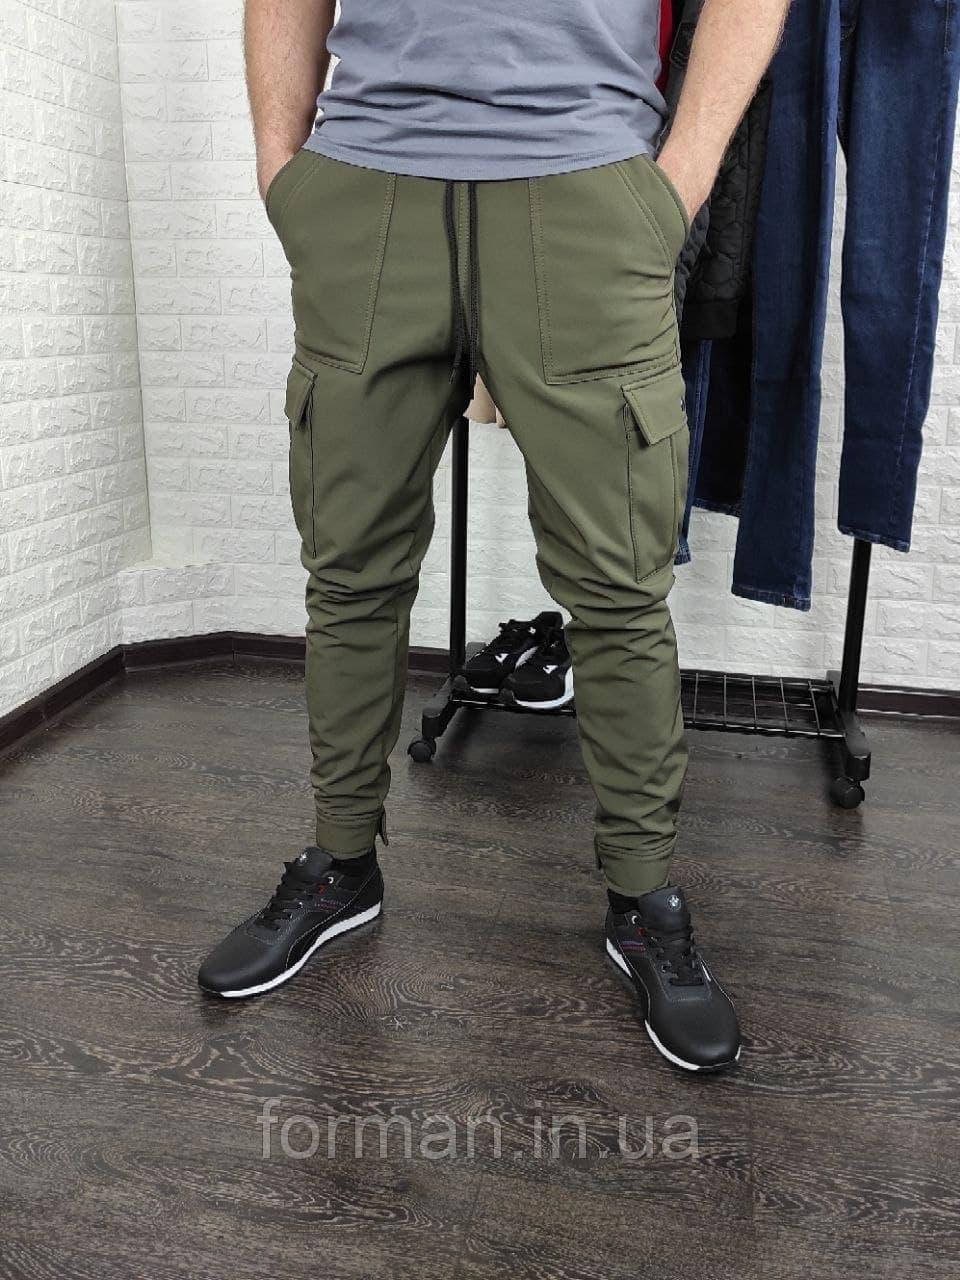 Мужские утеплённые штаны карго SoftShell хаки